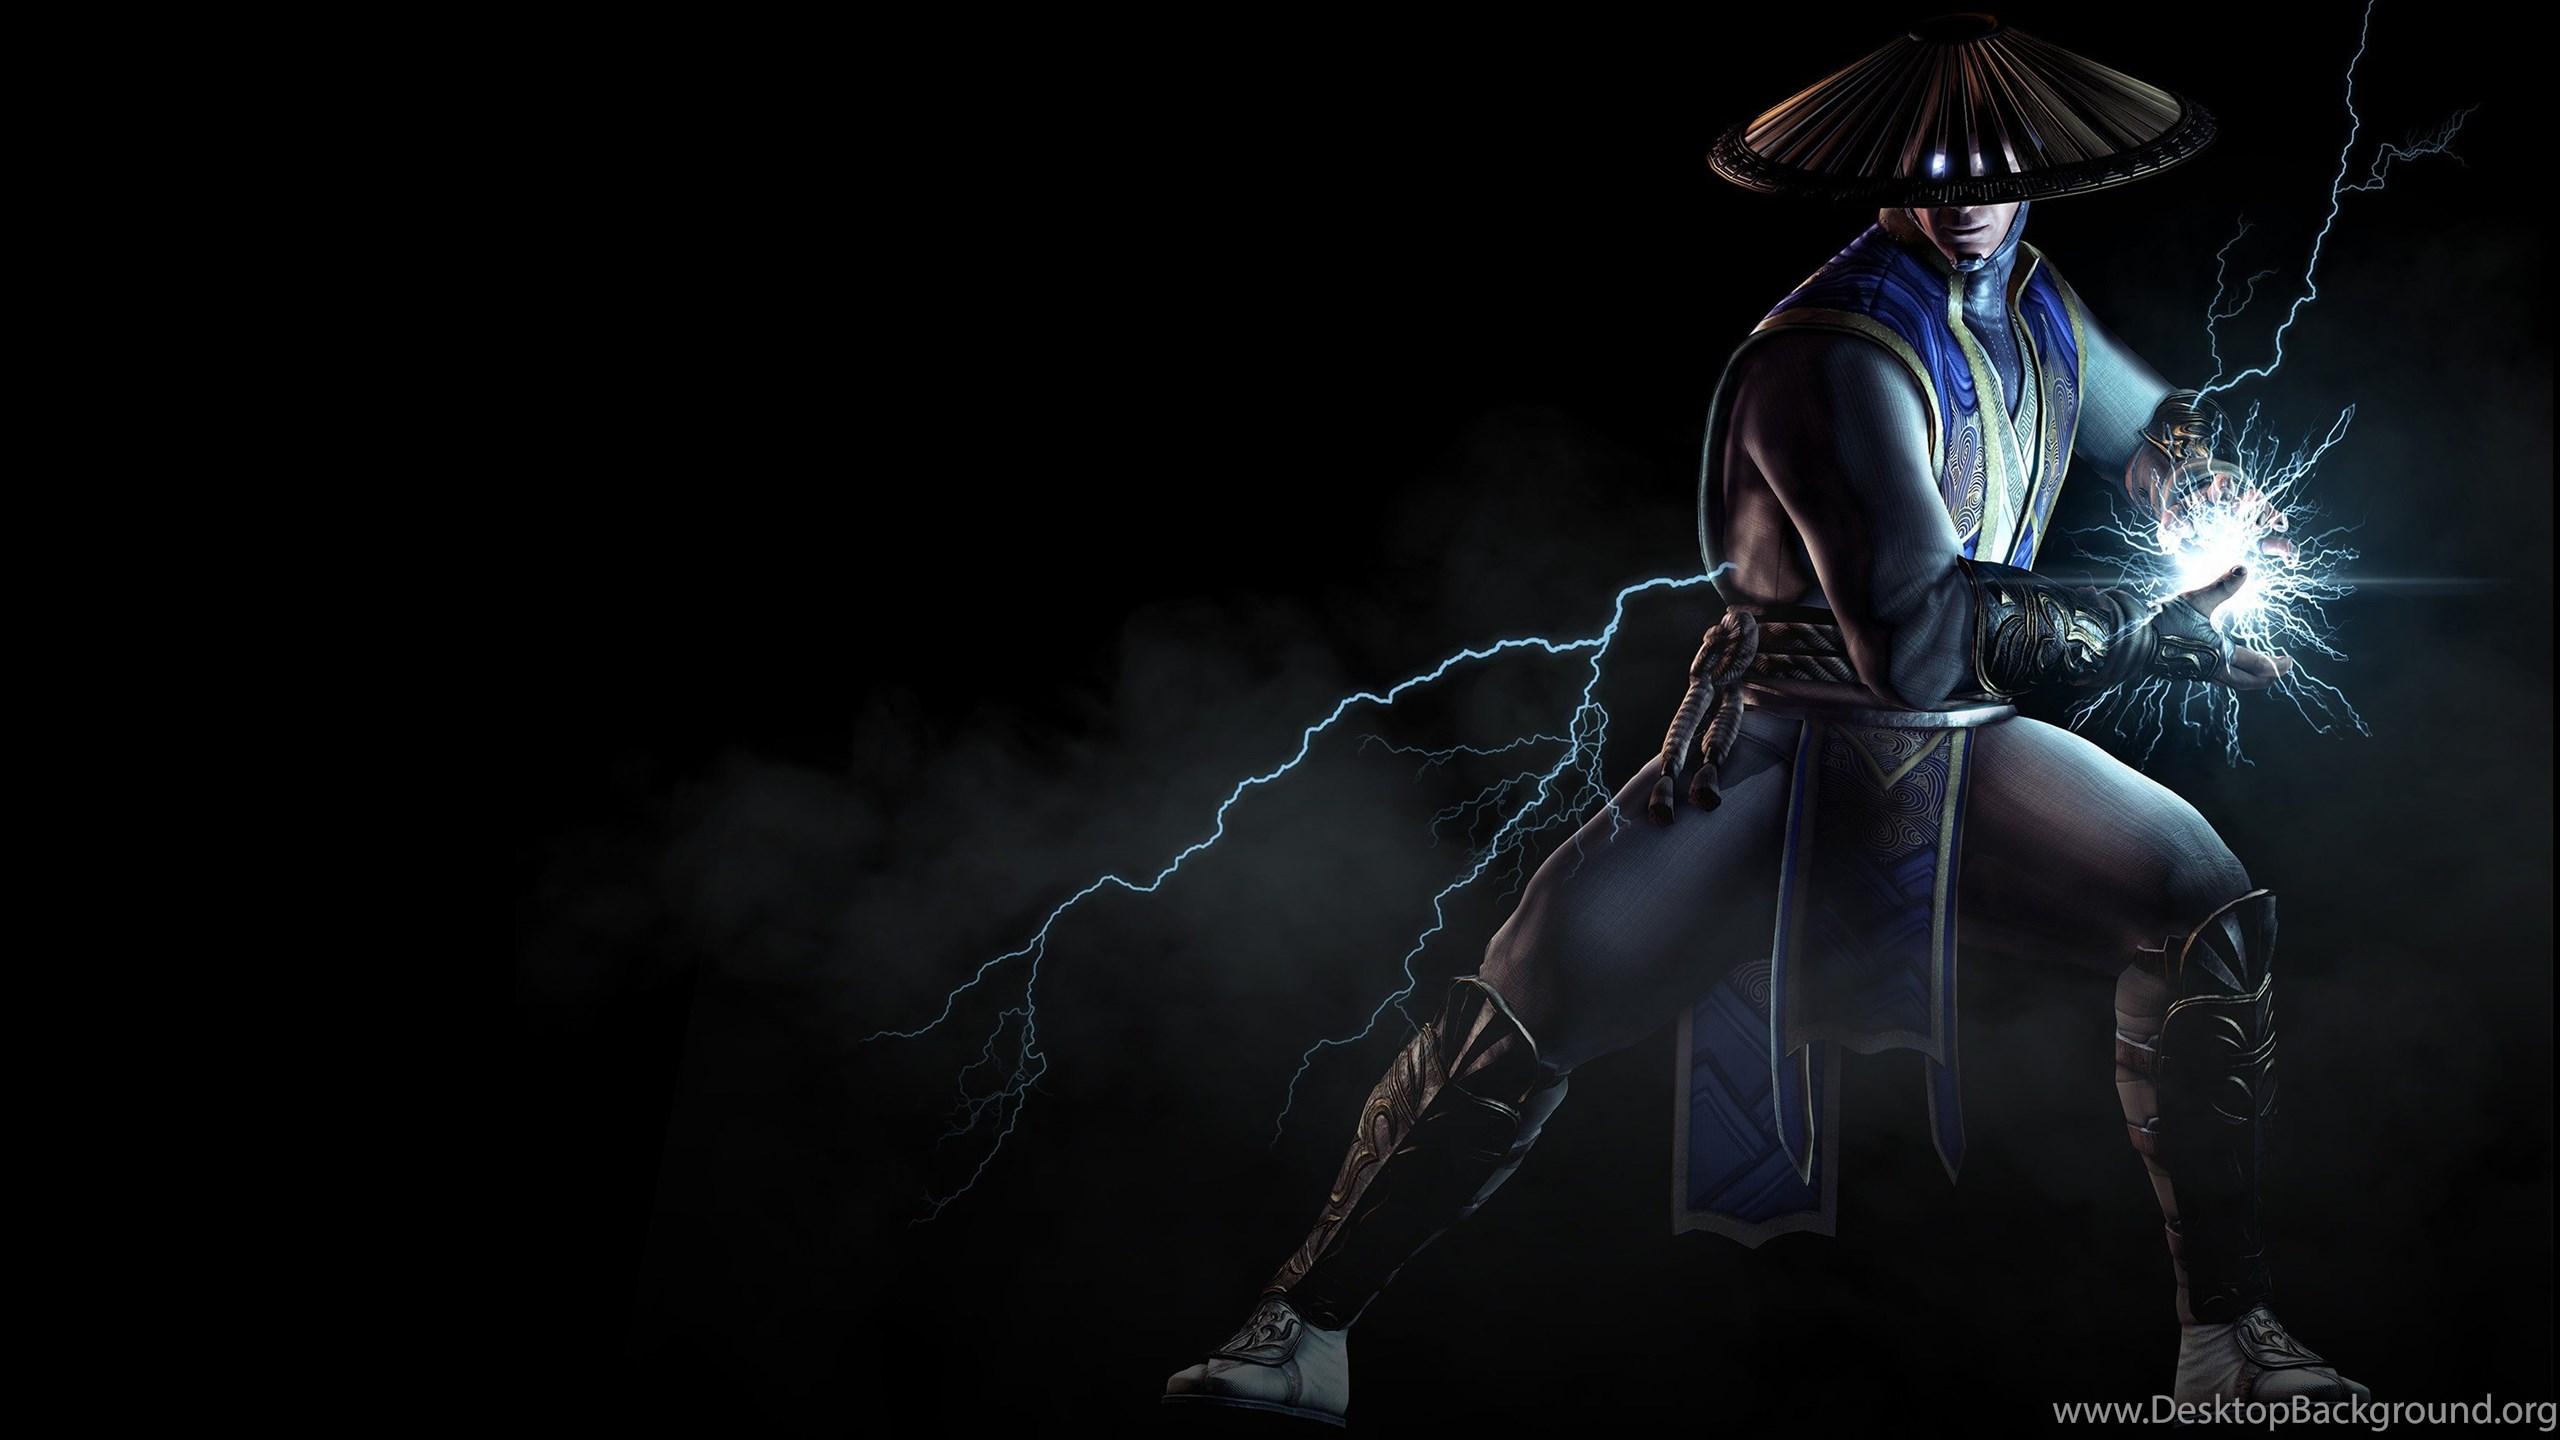 Raiden Mortal Kombat X Mortal Kombat Video Games Wallpapers Hd